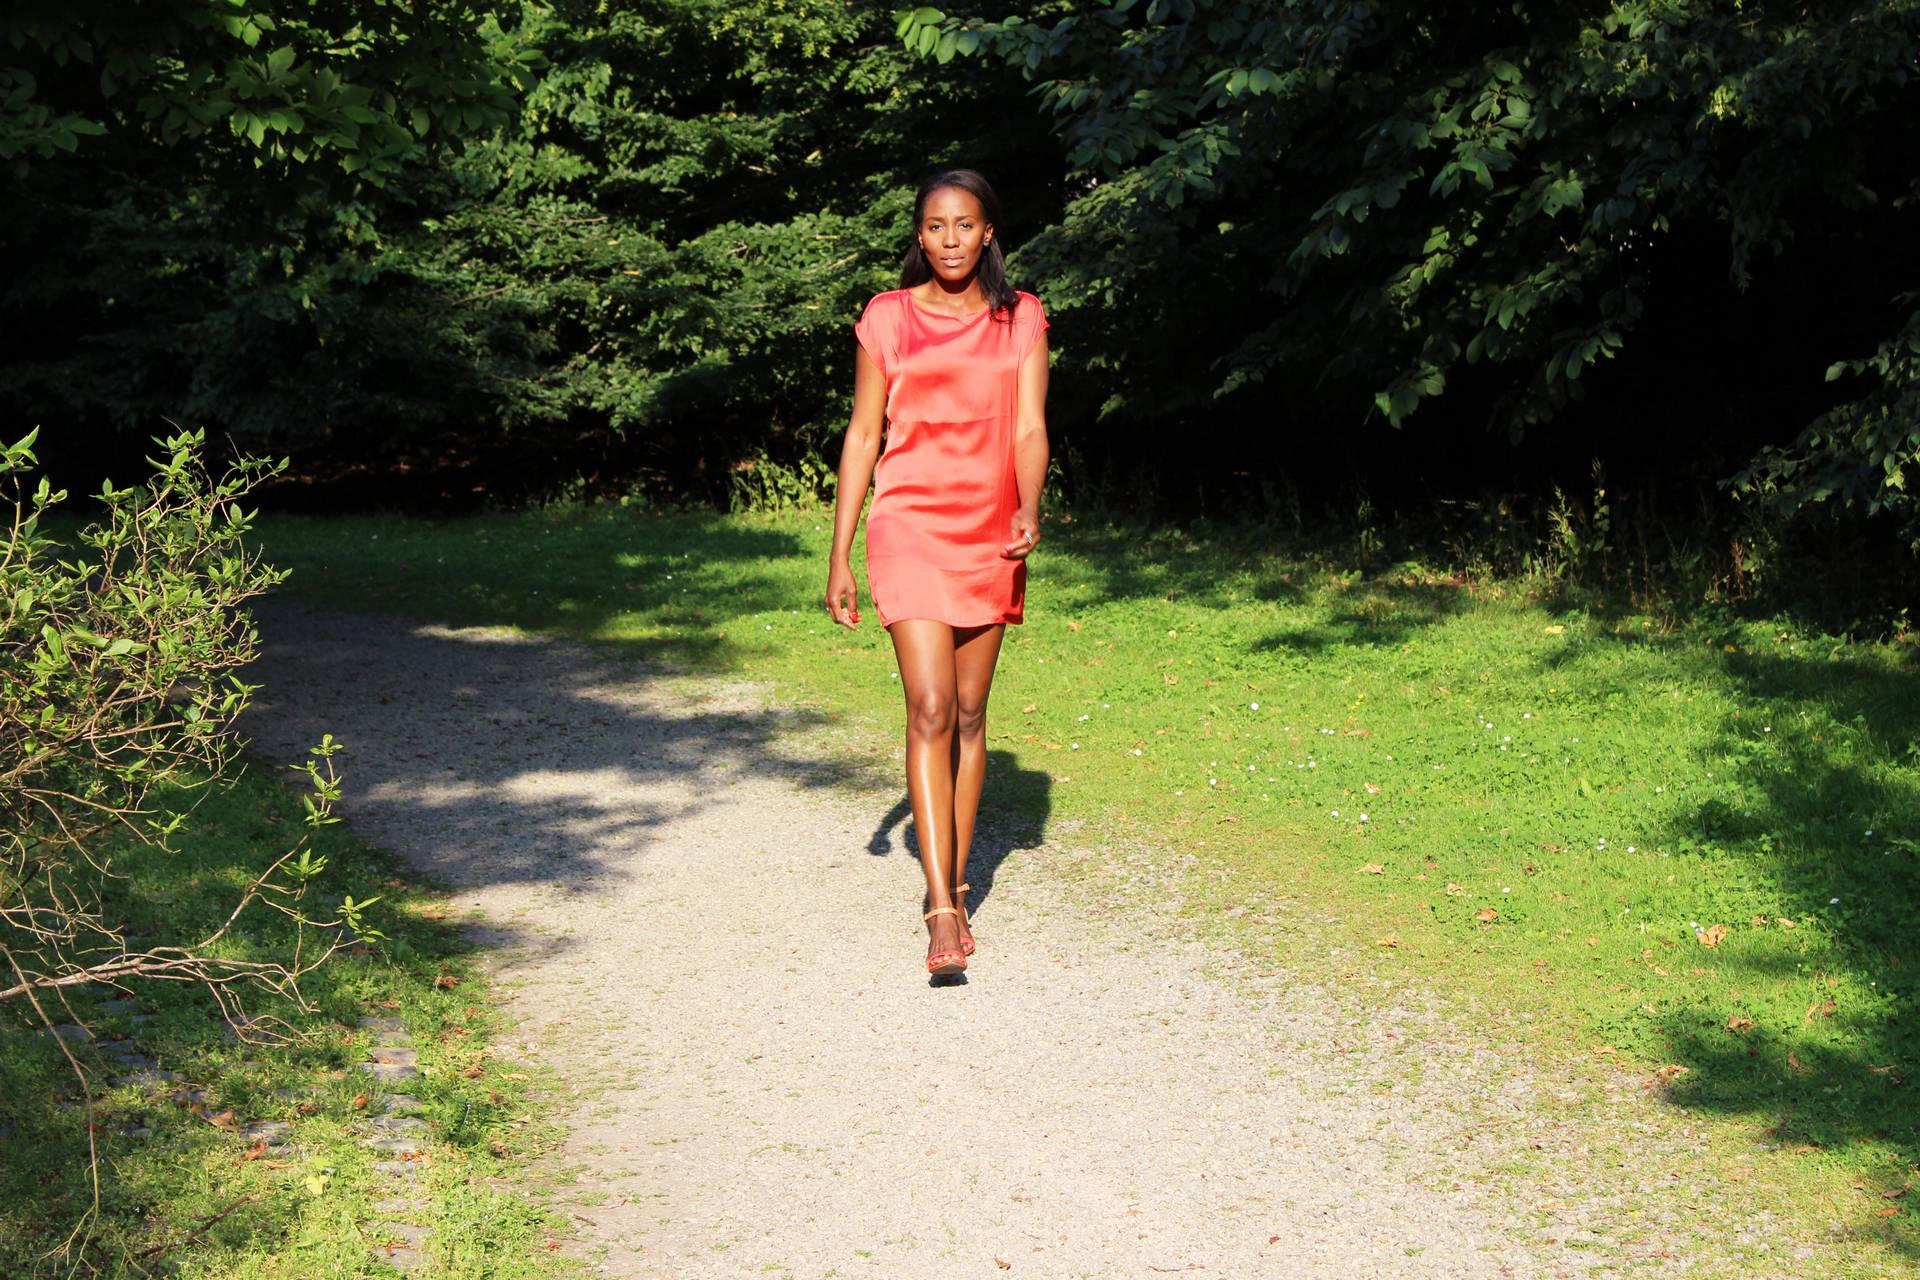 nunaavane-new-orange-dress-satin-fashion-blogger-beauty-youtuber-choosetobebeautiful